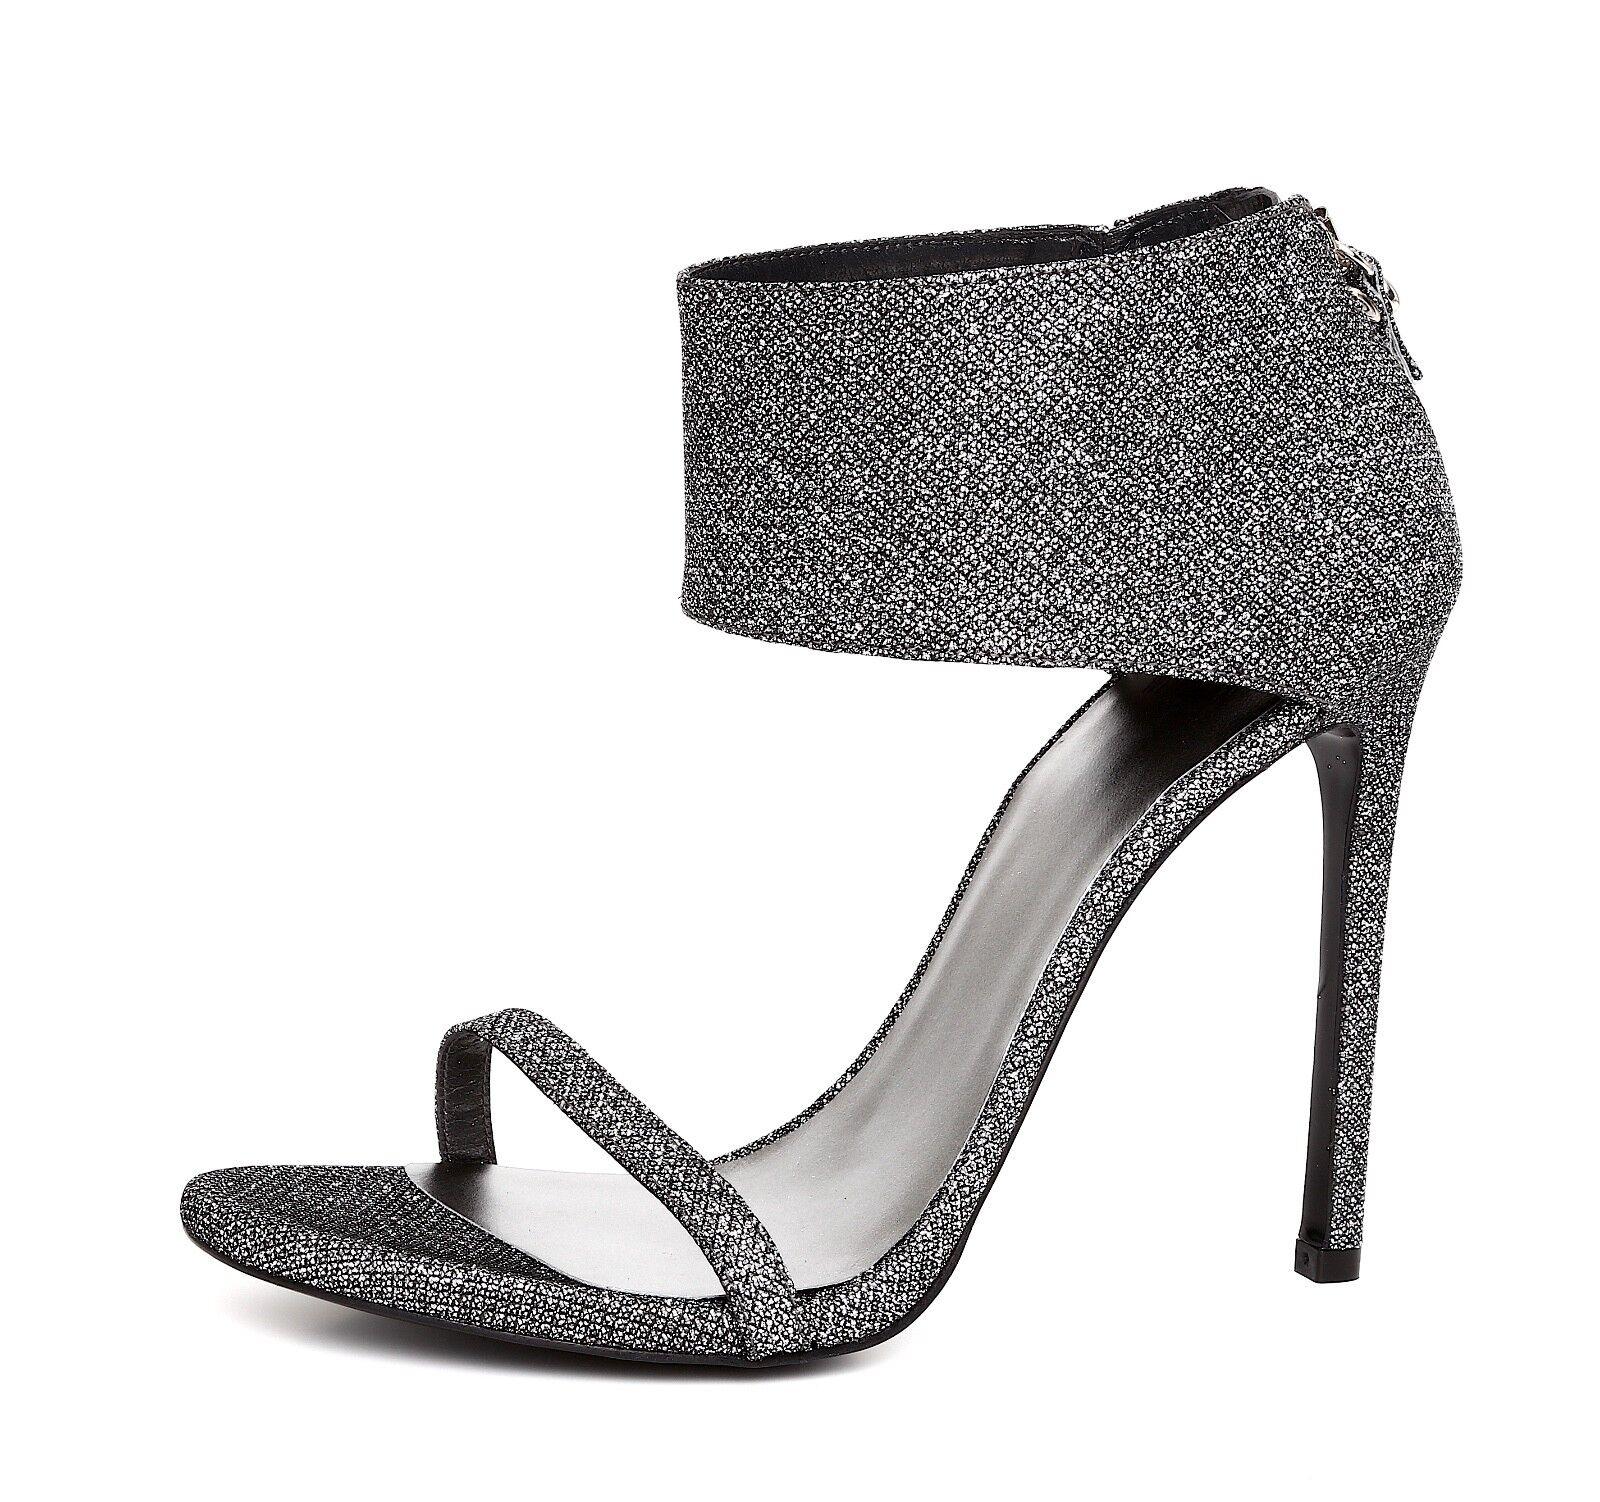 Stuart Weitzman Showgirl Women's Silver Ankle Cuff Sandal Sz 10.5M 4519